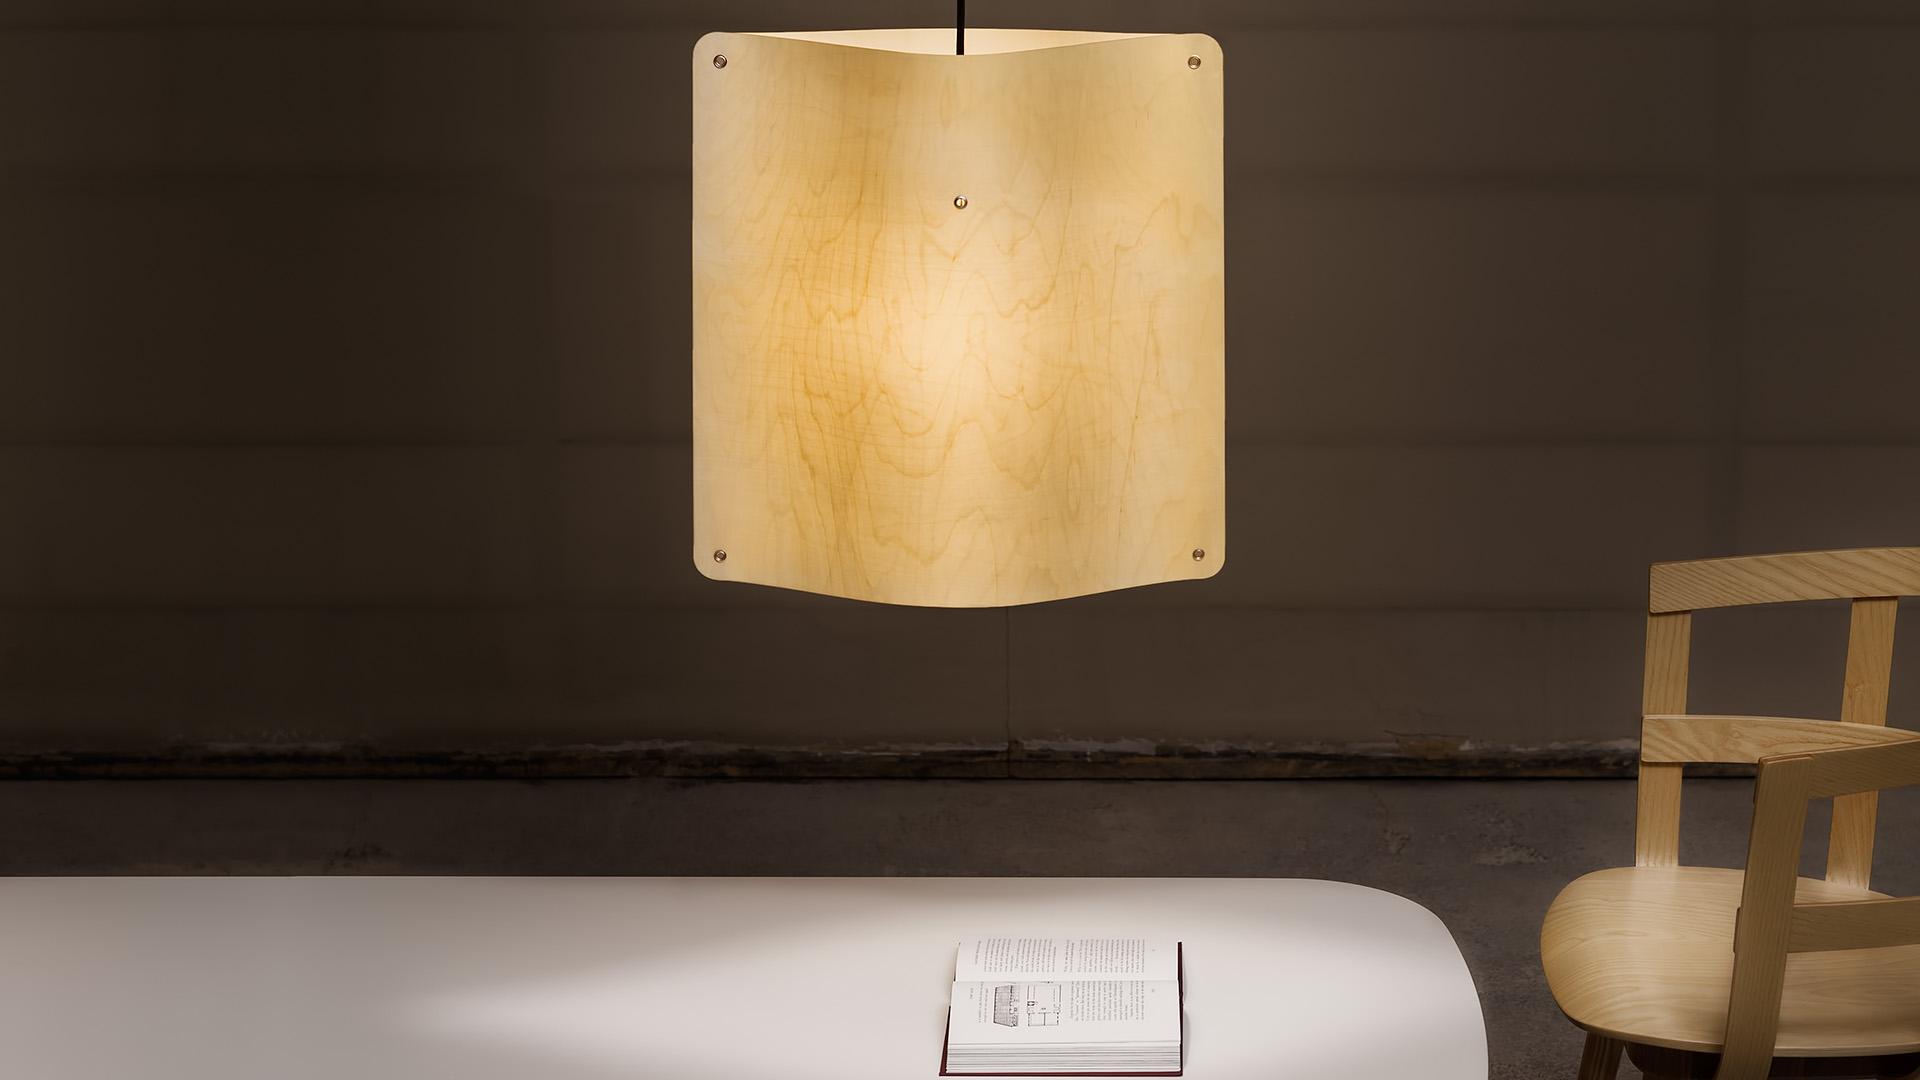 acf3077e8f0b3 About us. The Finom designer lights have been designed by interior  architecht Esa Vesmanen ...